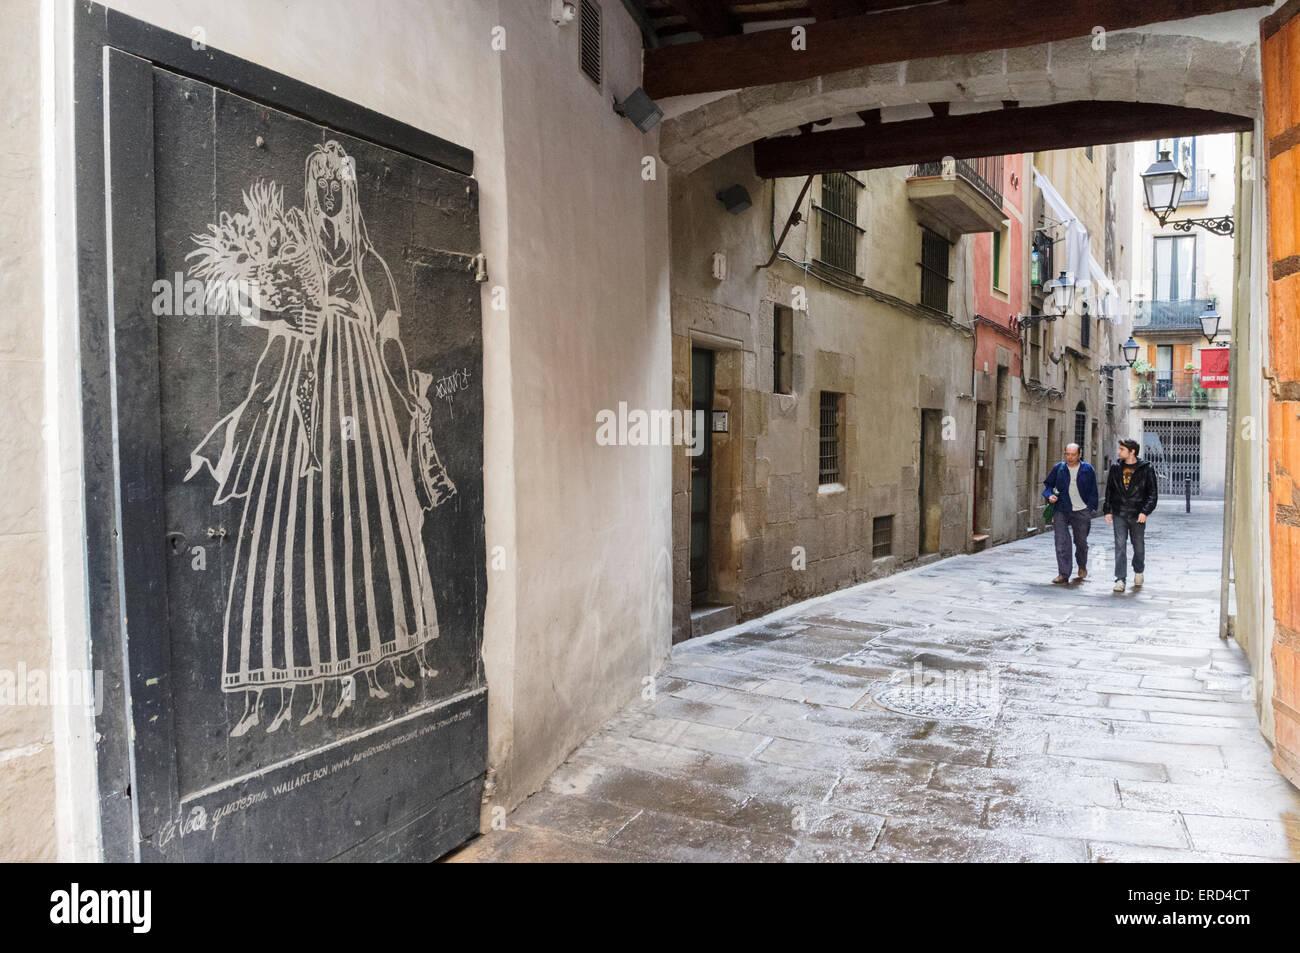 Image of 'La Vella Quaresma' in La Ribera-Born, Barcelona, Catalonia, Spain. Street scene - Stock Image